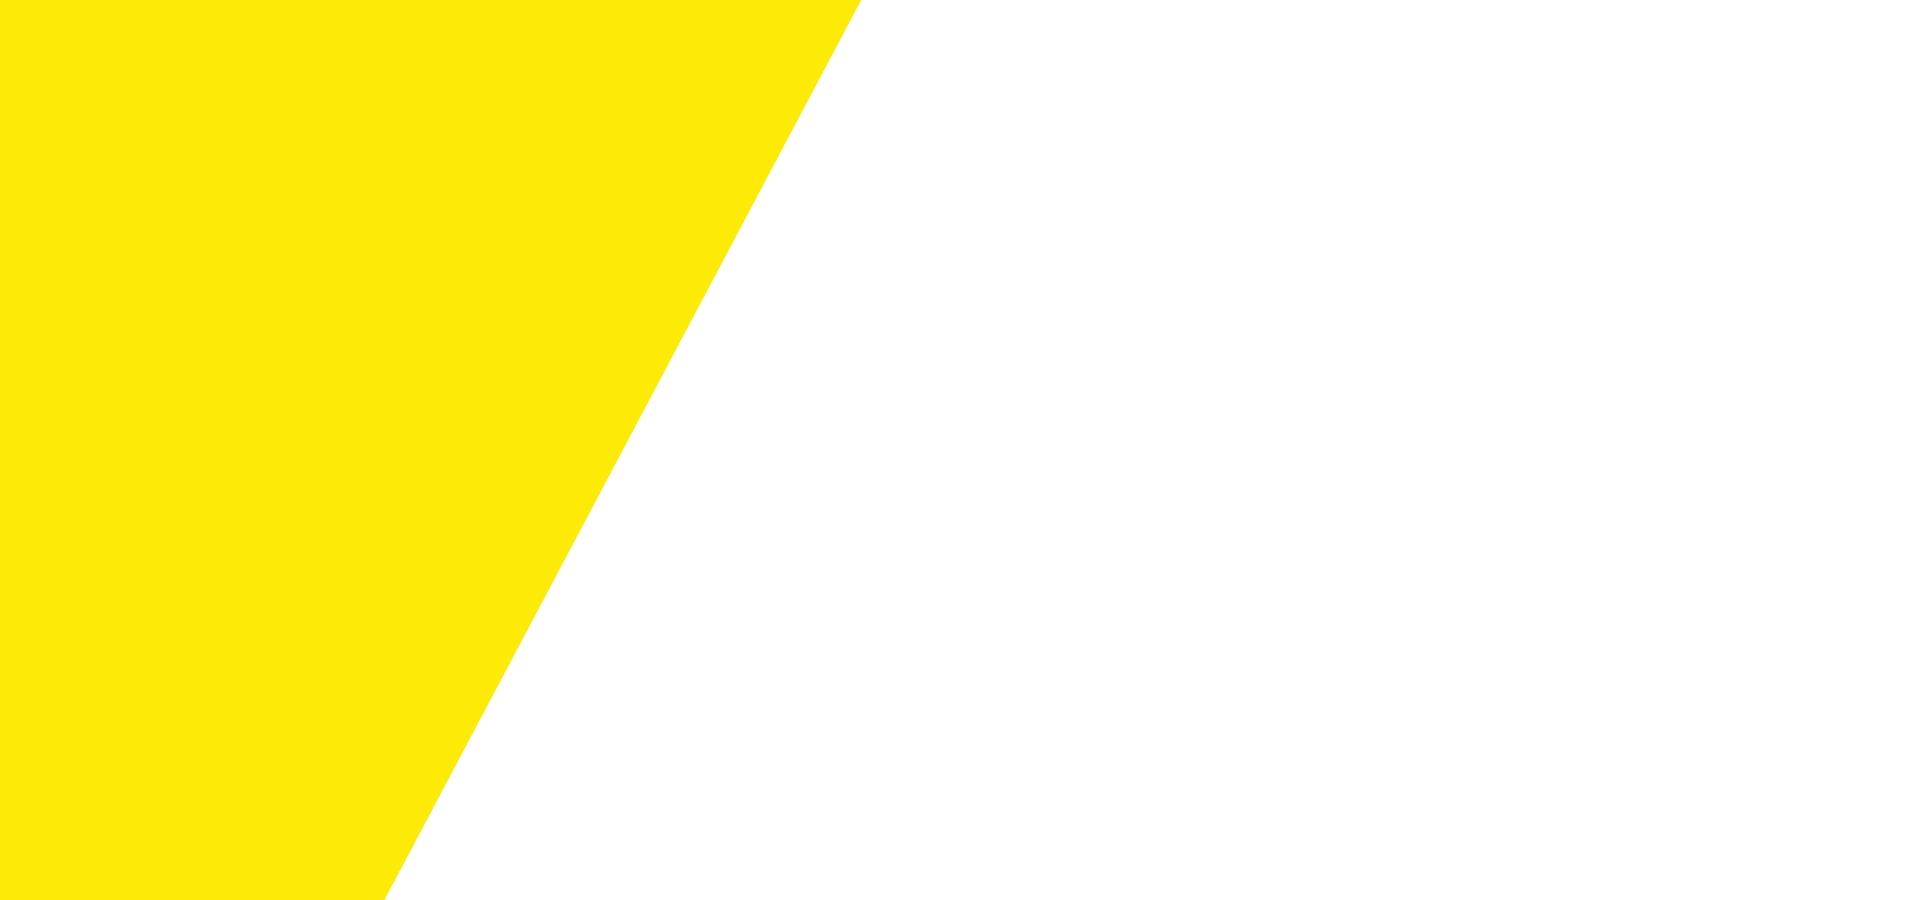 żółty pasek